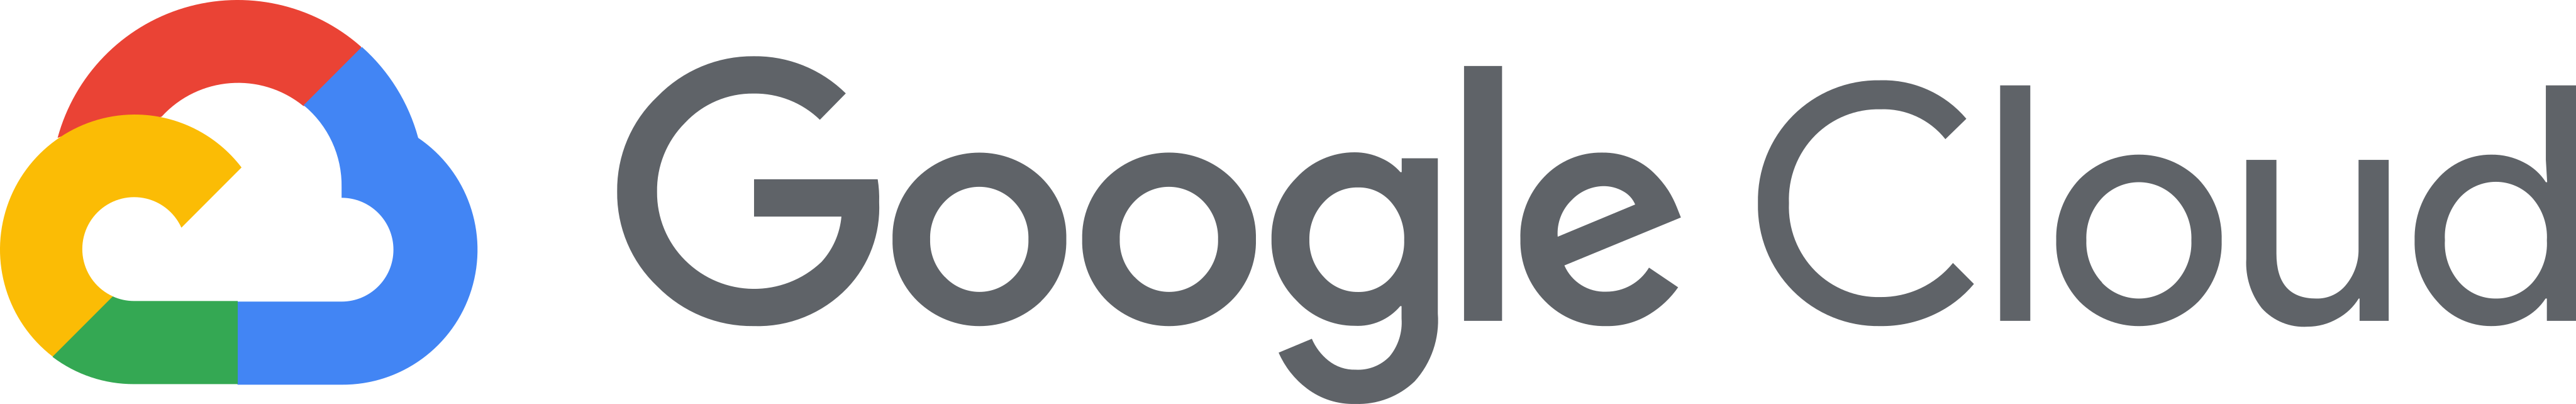 google cloud logo - Google Cloud Logo